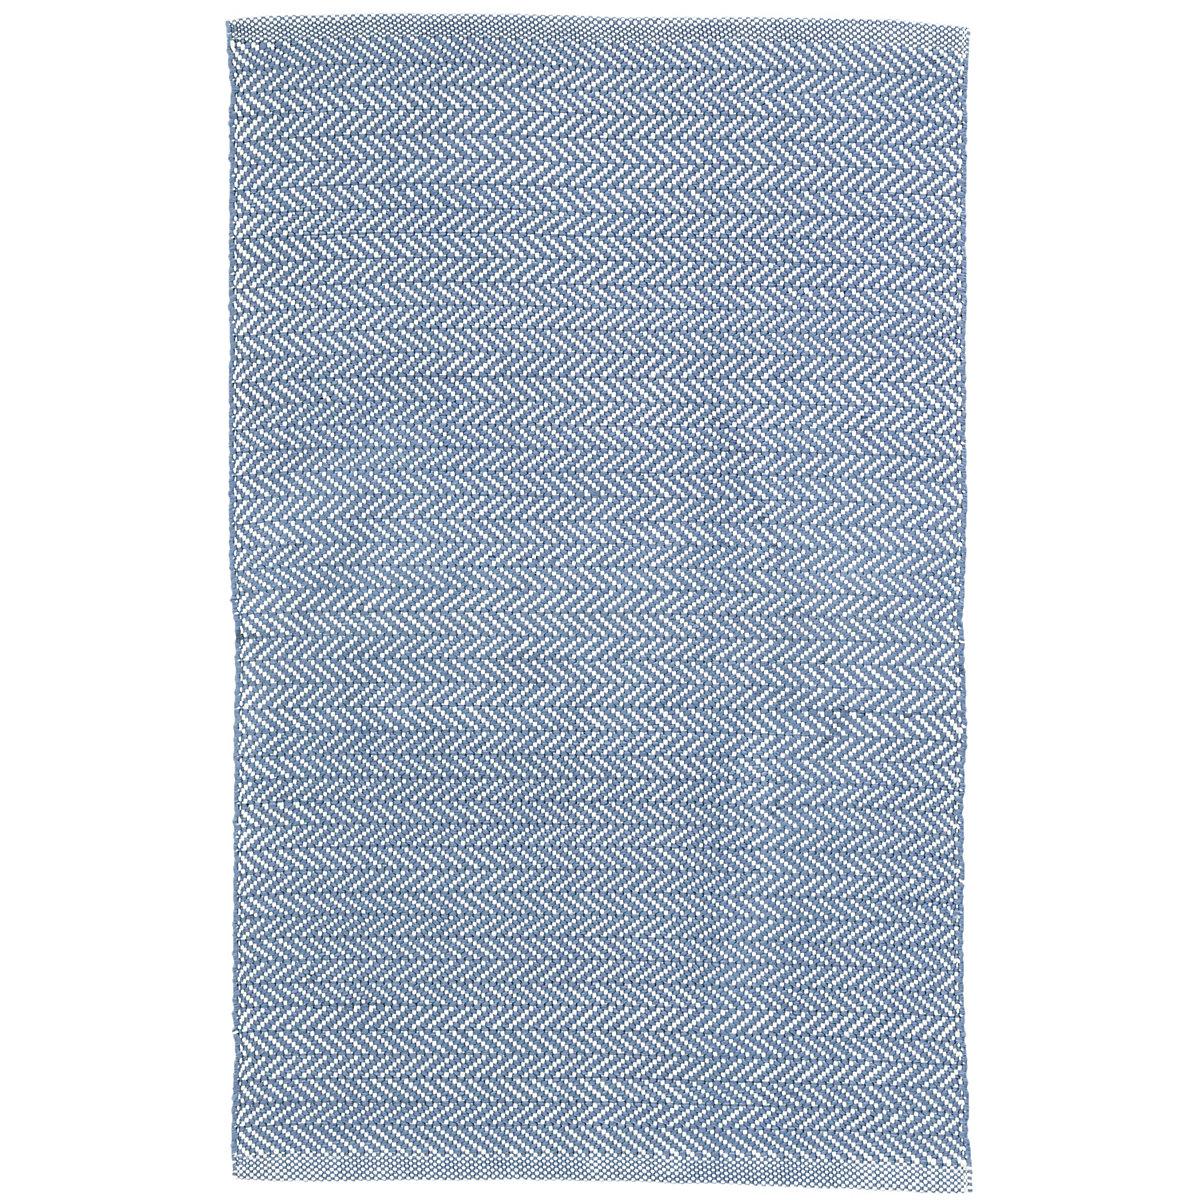 rug albert cotton dove woven in herringbone grey products dash buy design by